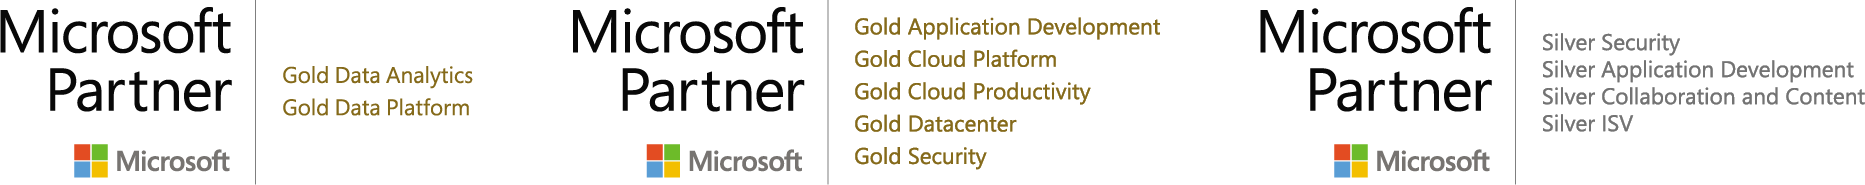 Microsoft Silver & Gold Badges